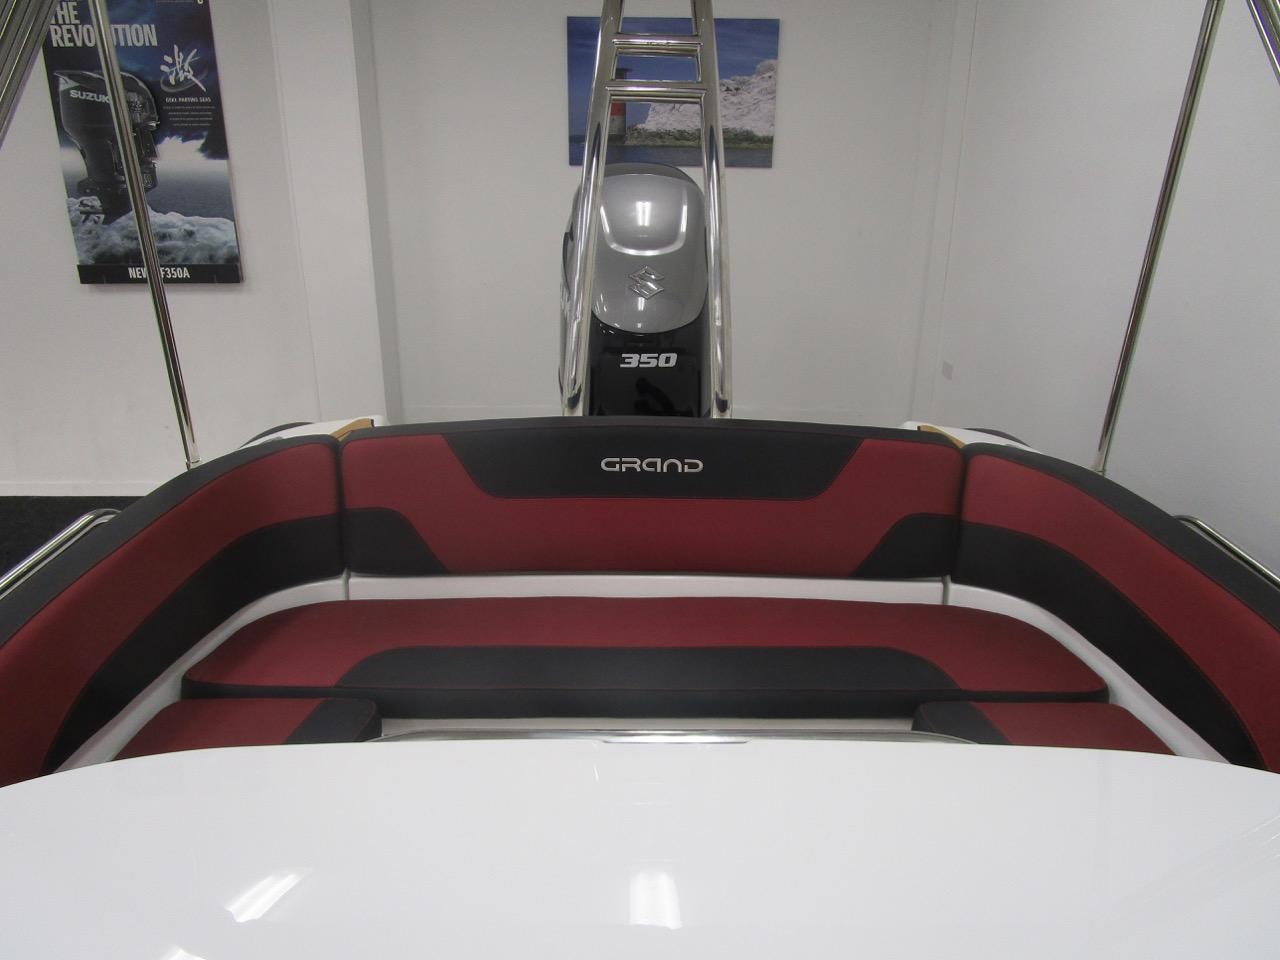 GRAND G850 RIB rear seat facing aft